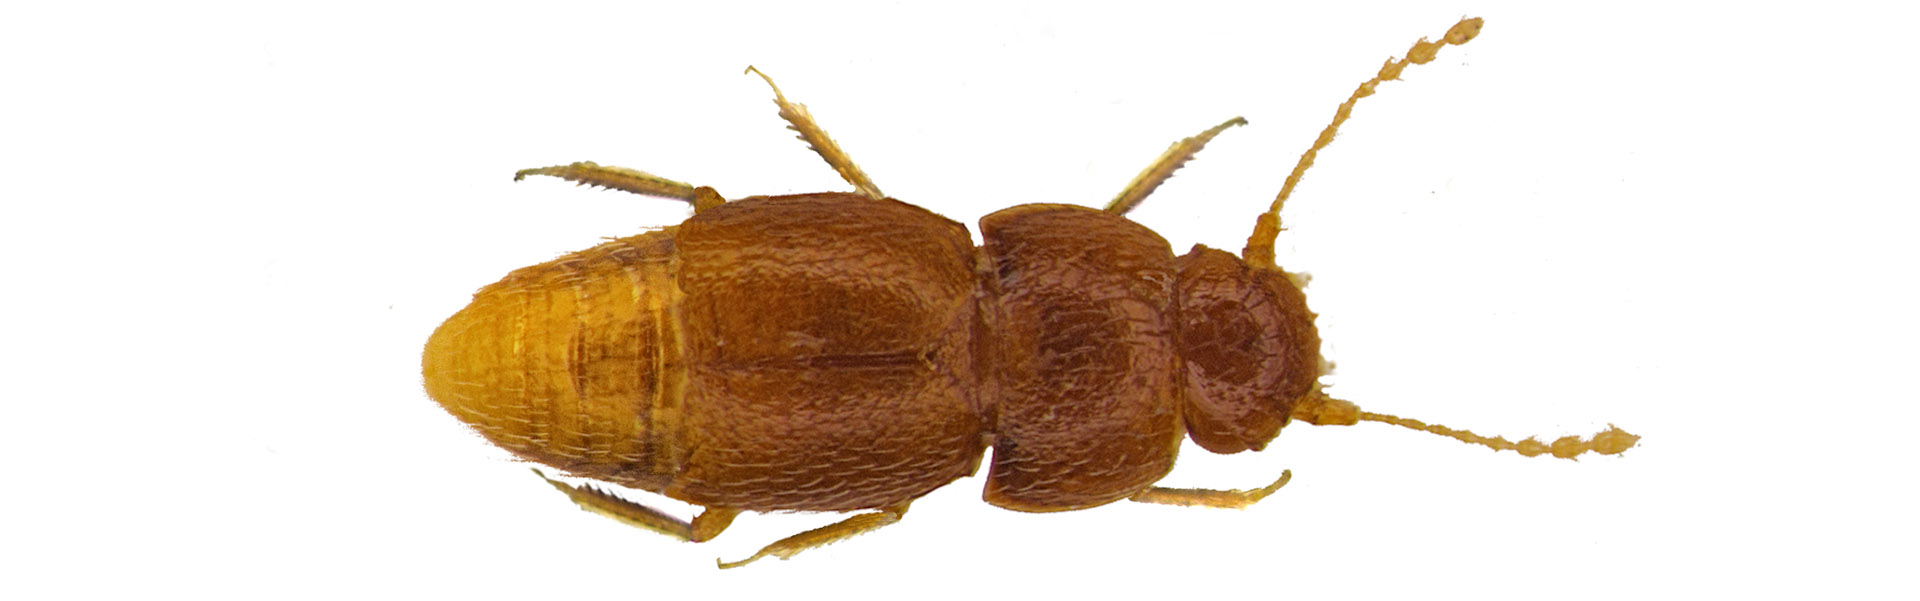 greta böcek